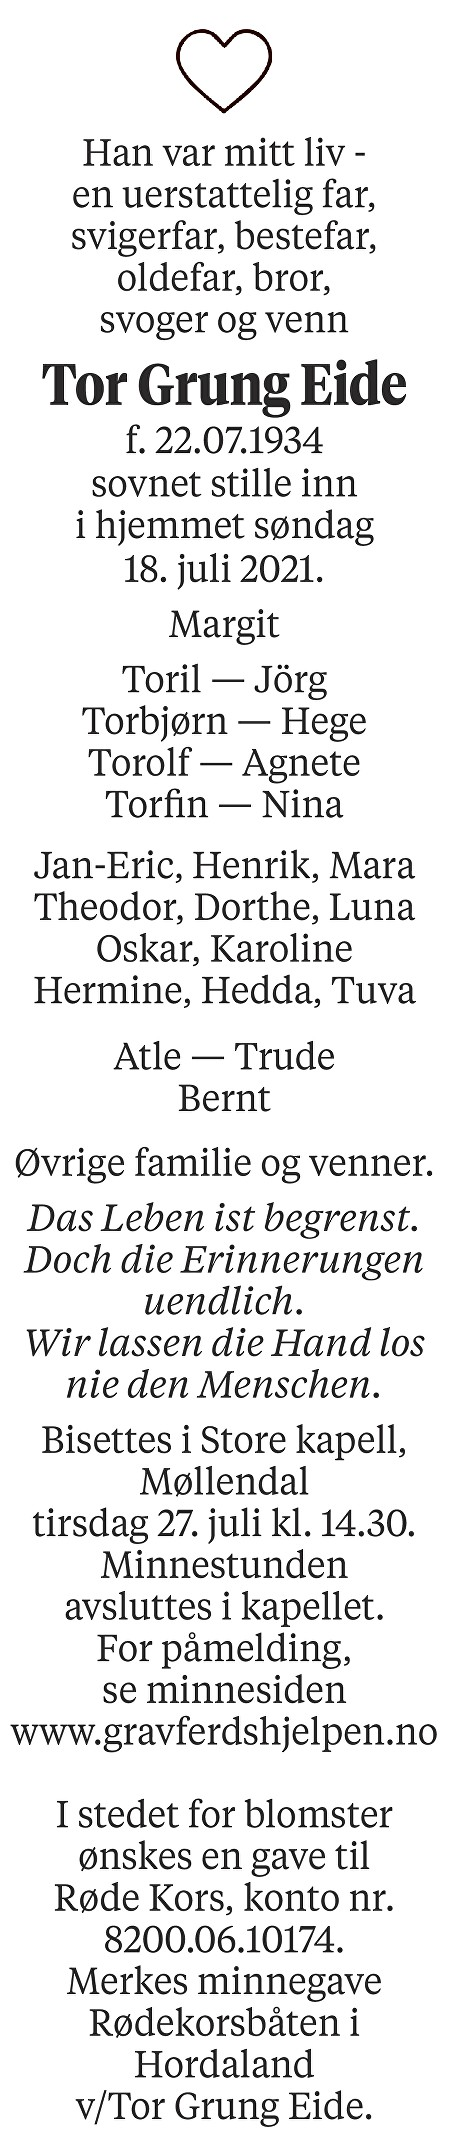 Tor Grung Eide Dødsannonse